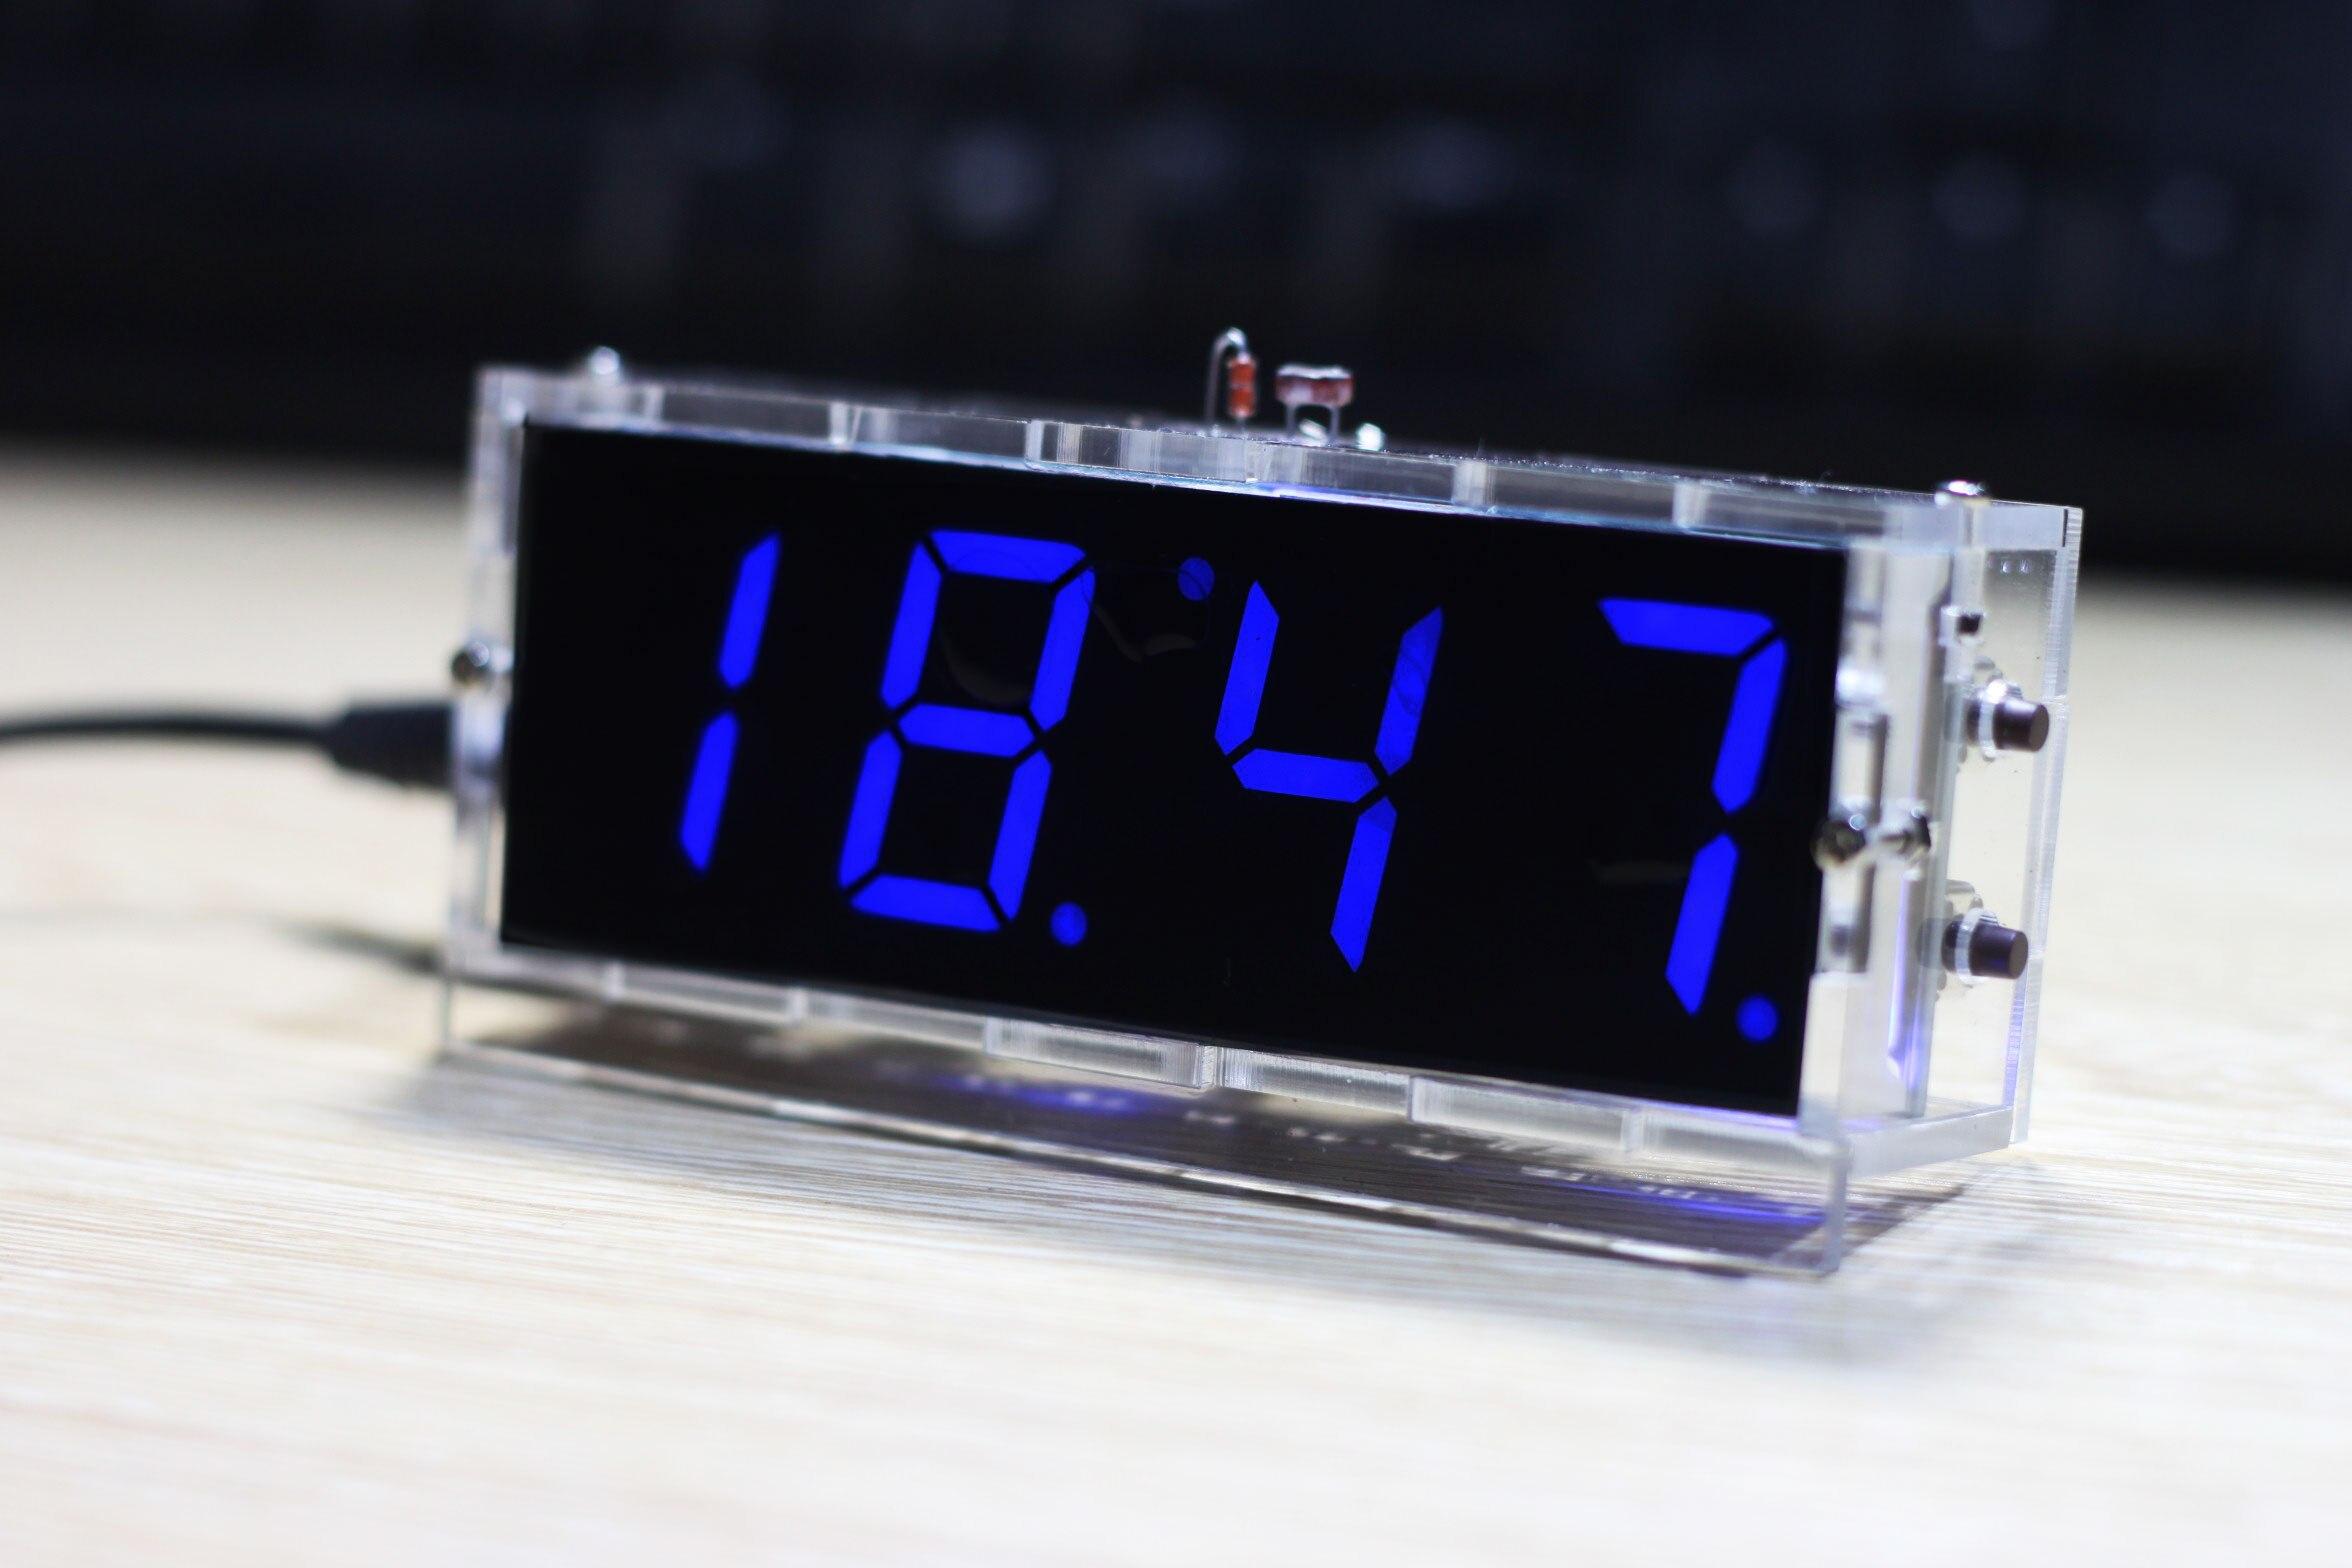 microcontroller electronic clock - Blue LED Electronic Clock Time Thermometer Microcontroller Digital Clock DIY Kit With Tutorial